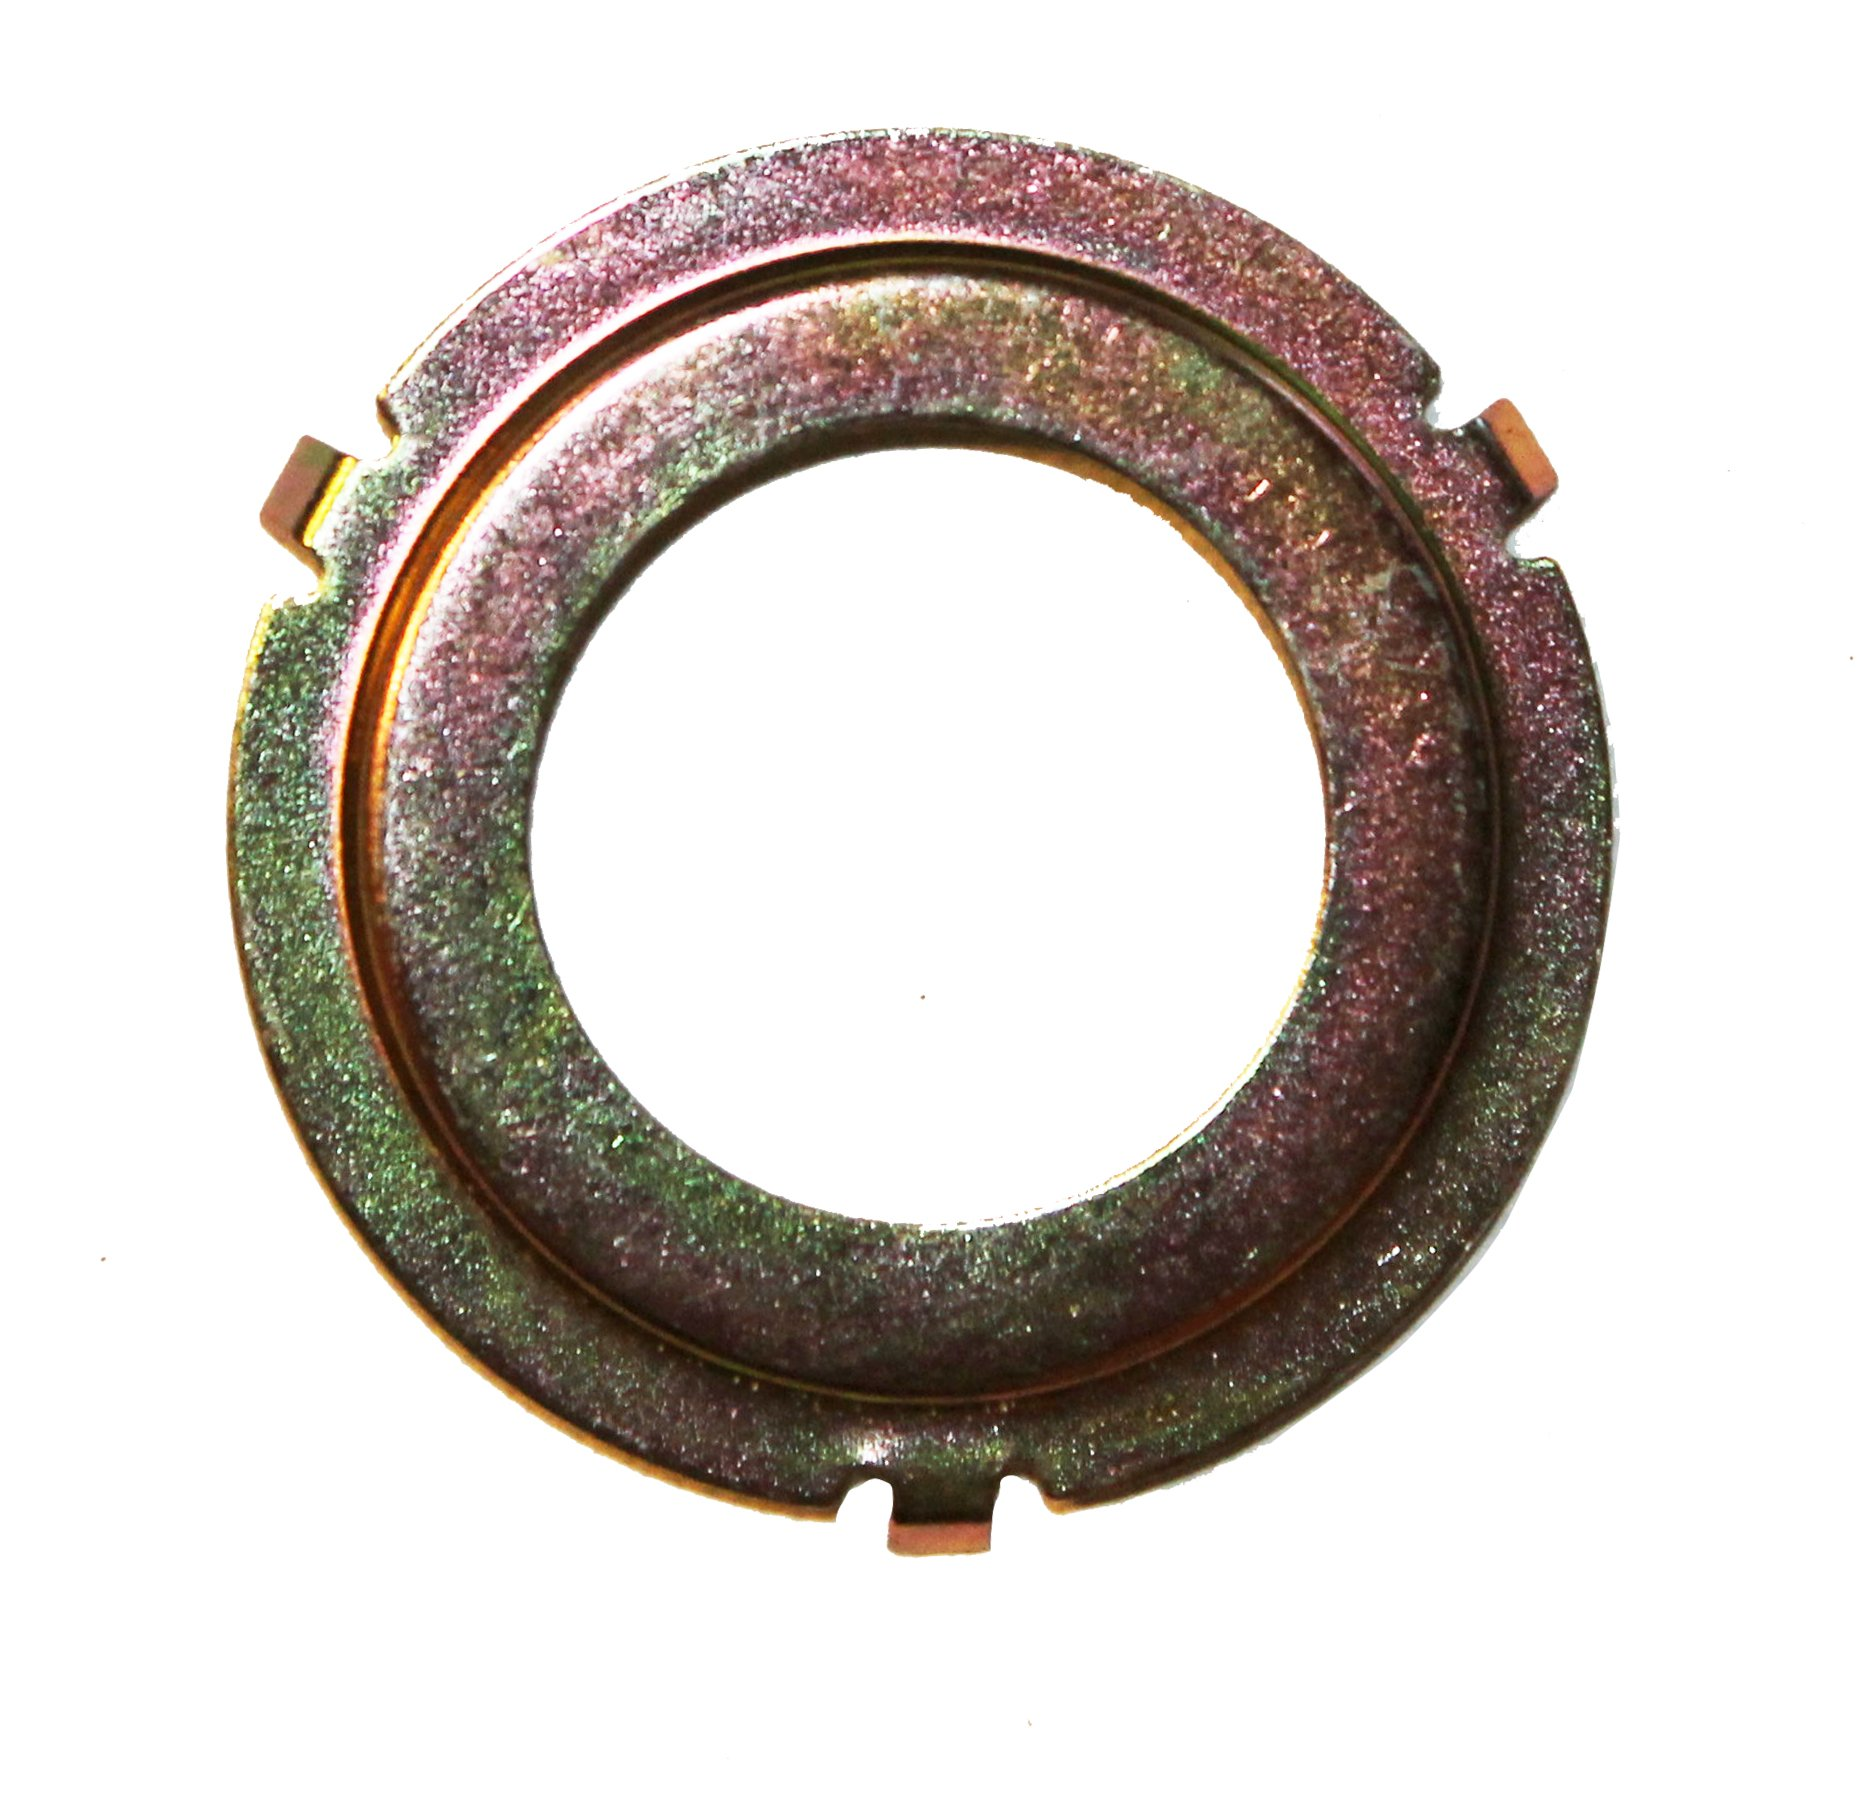 Corvette/Chevrolet 34699 Headlight Actuator Seal Retaining Ring